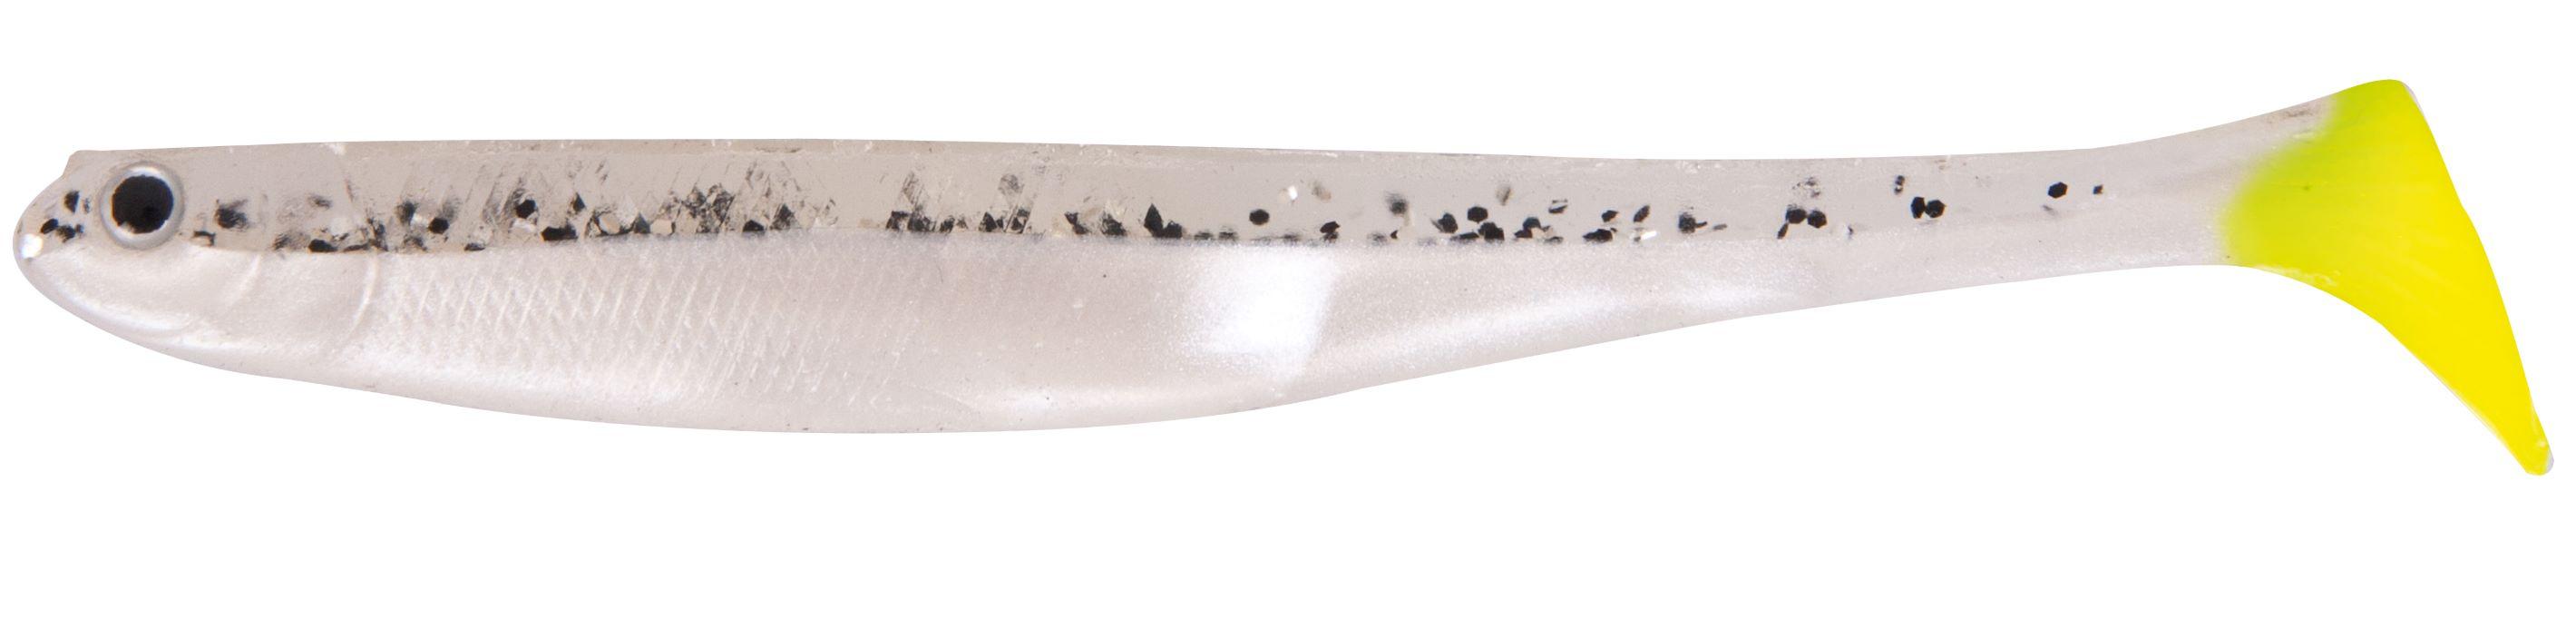 Iron Claw gumová nástraha Slim Jim 10 cm Vzor CT, 3 ks